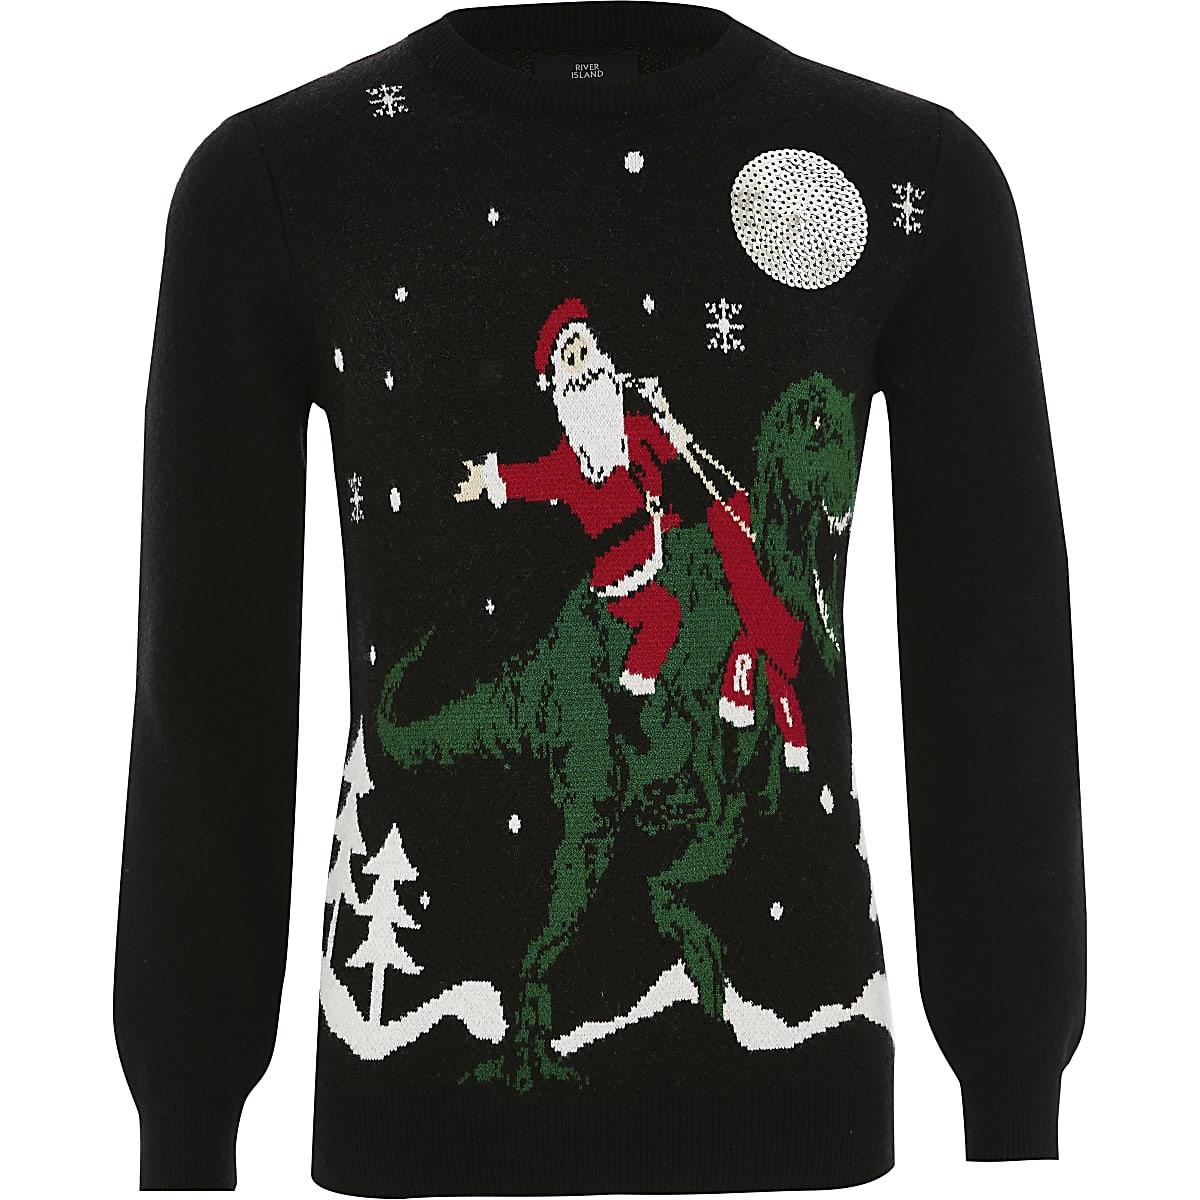 Boys Santa black Christmas jumper